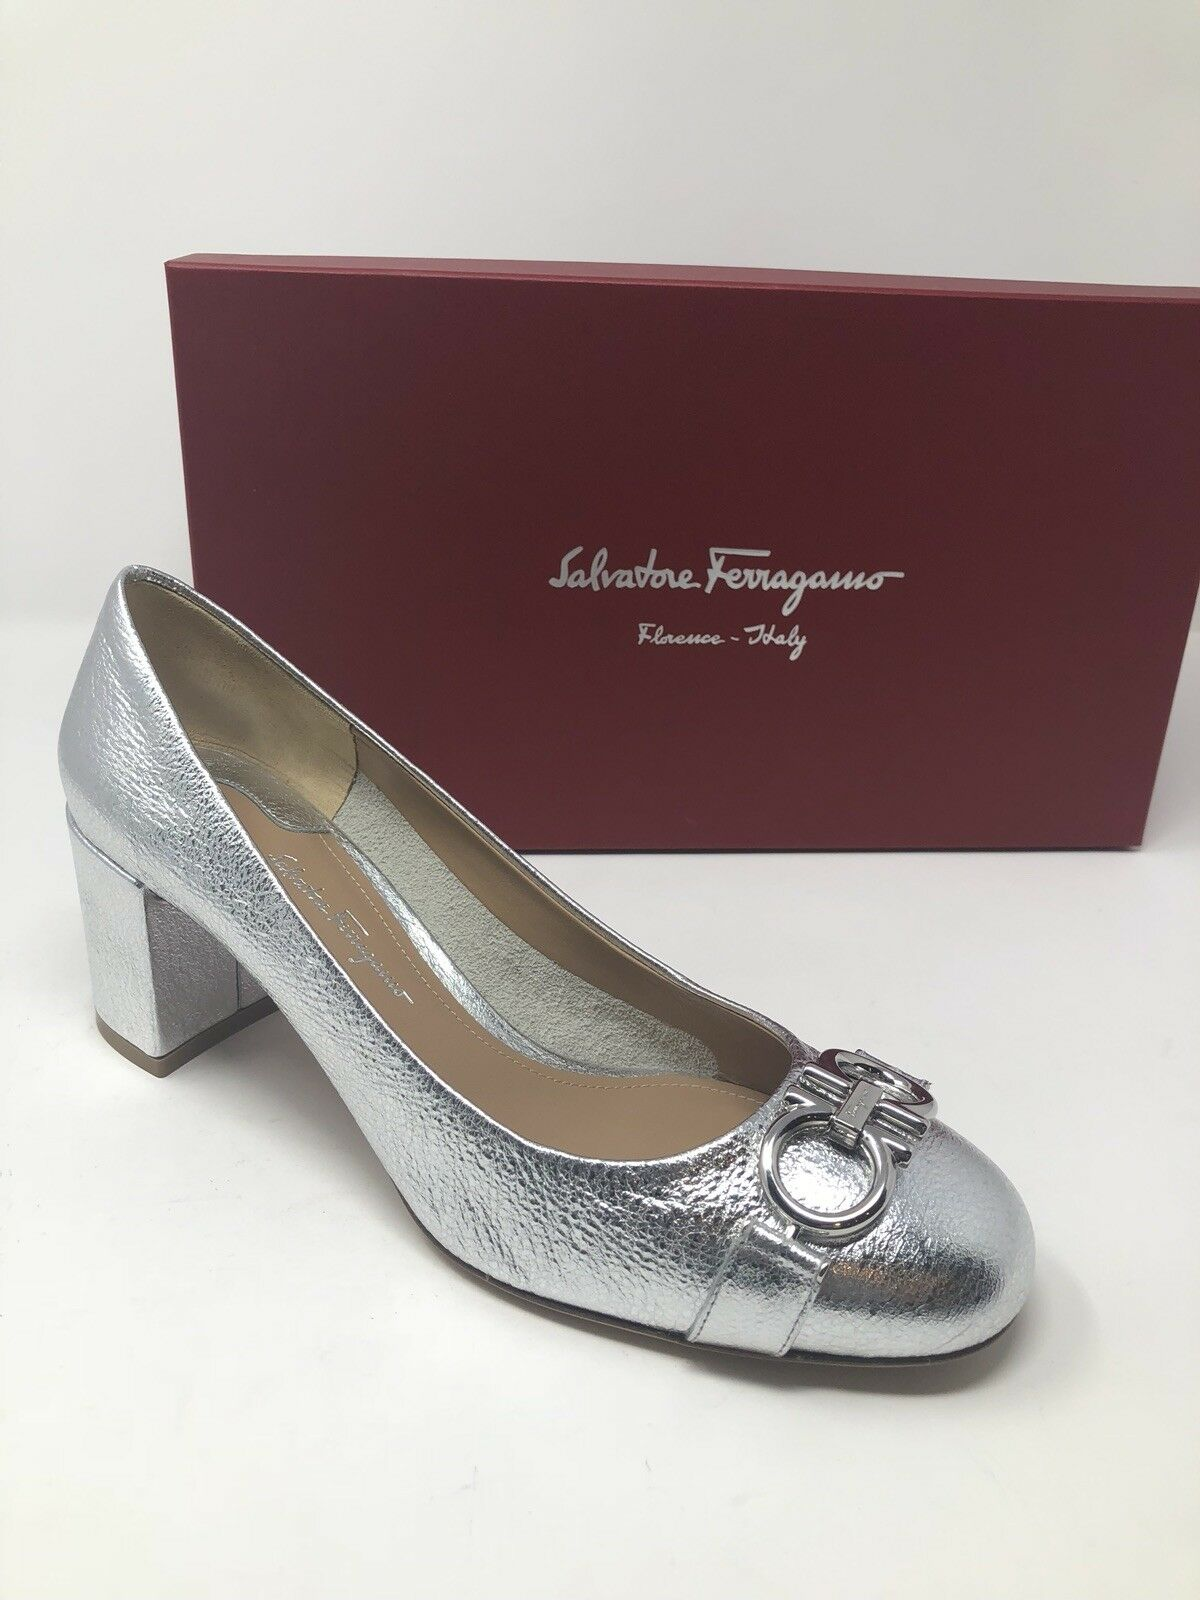 600 New Salvatore Ferragamo Womens Silver Heels Pumps Ladies shoes Size 7.5 C